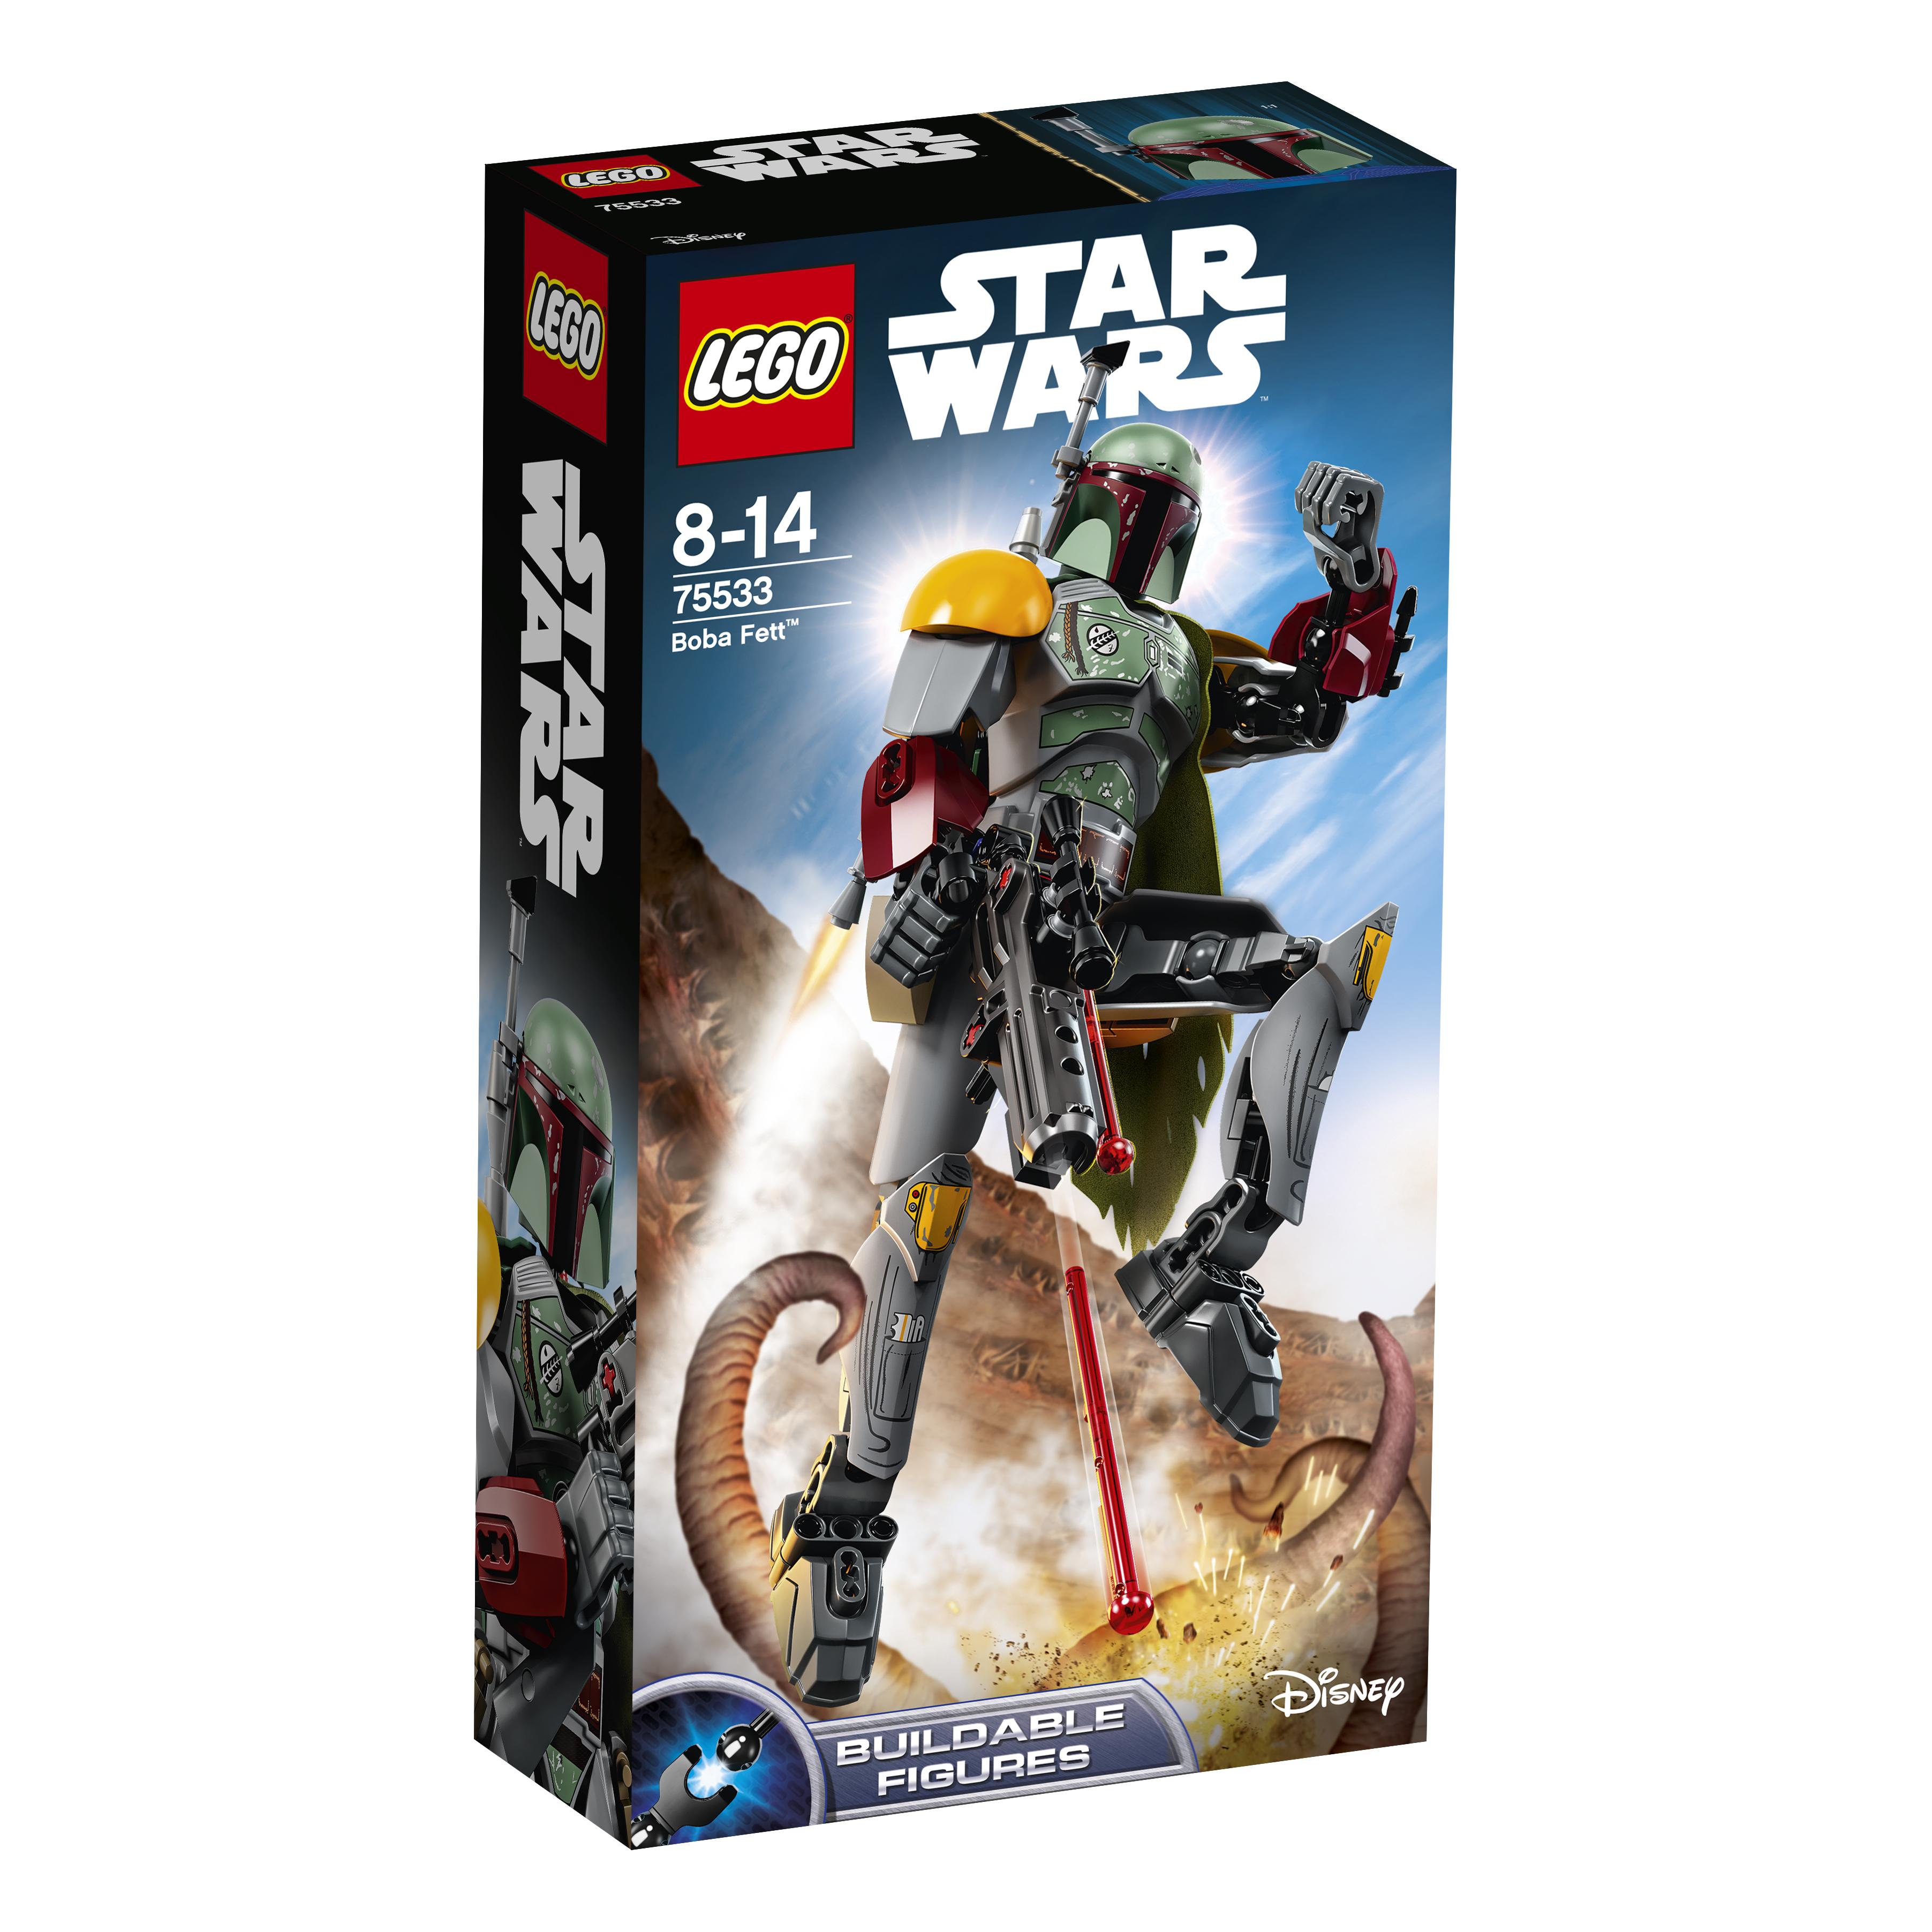 Star Wars LEGO Конструктор LEGO Constraction Star Wars 75533 Боба Фетт